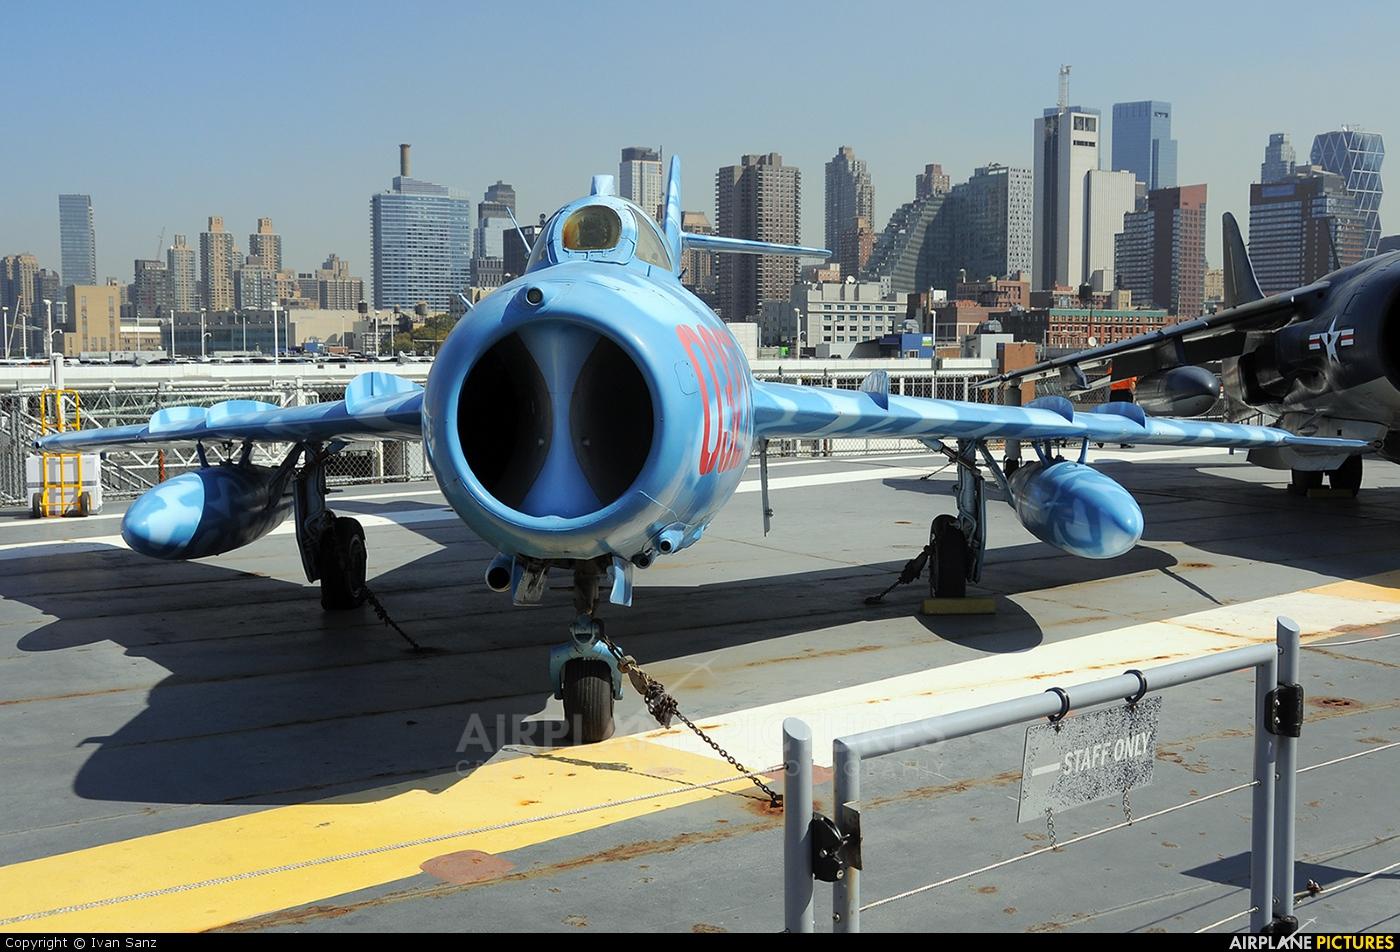 Vietnam - Air Force 0327 aircraft at New York - Intrepid Sea Air Museum